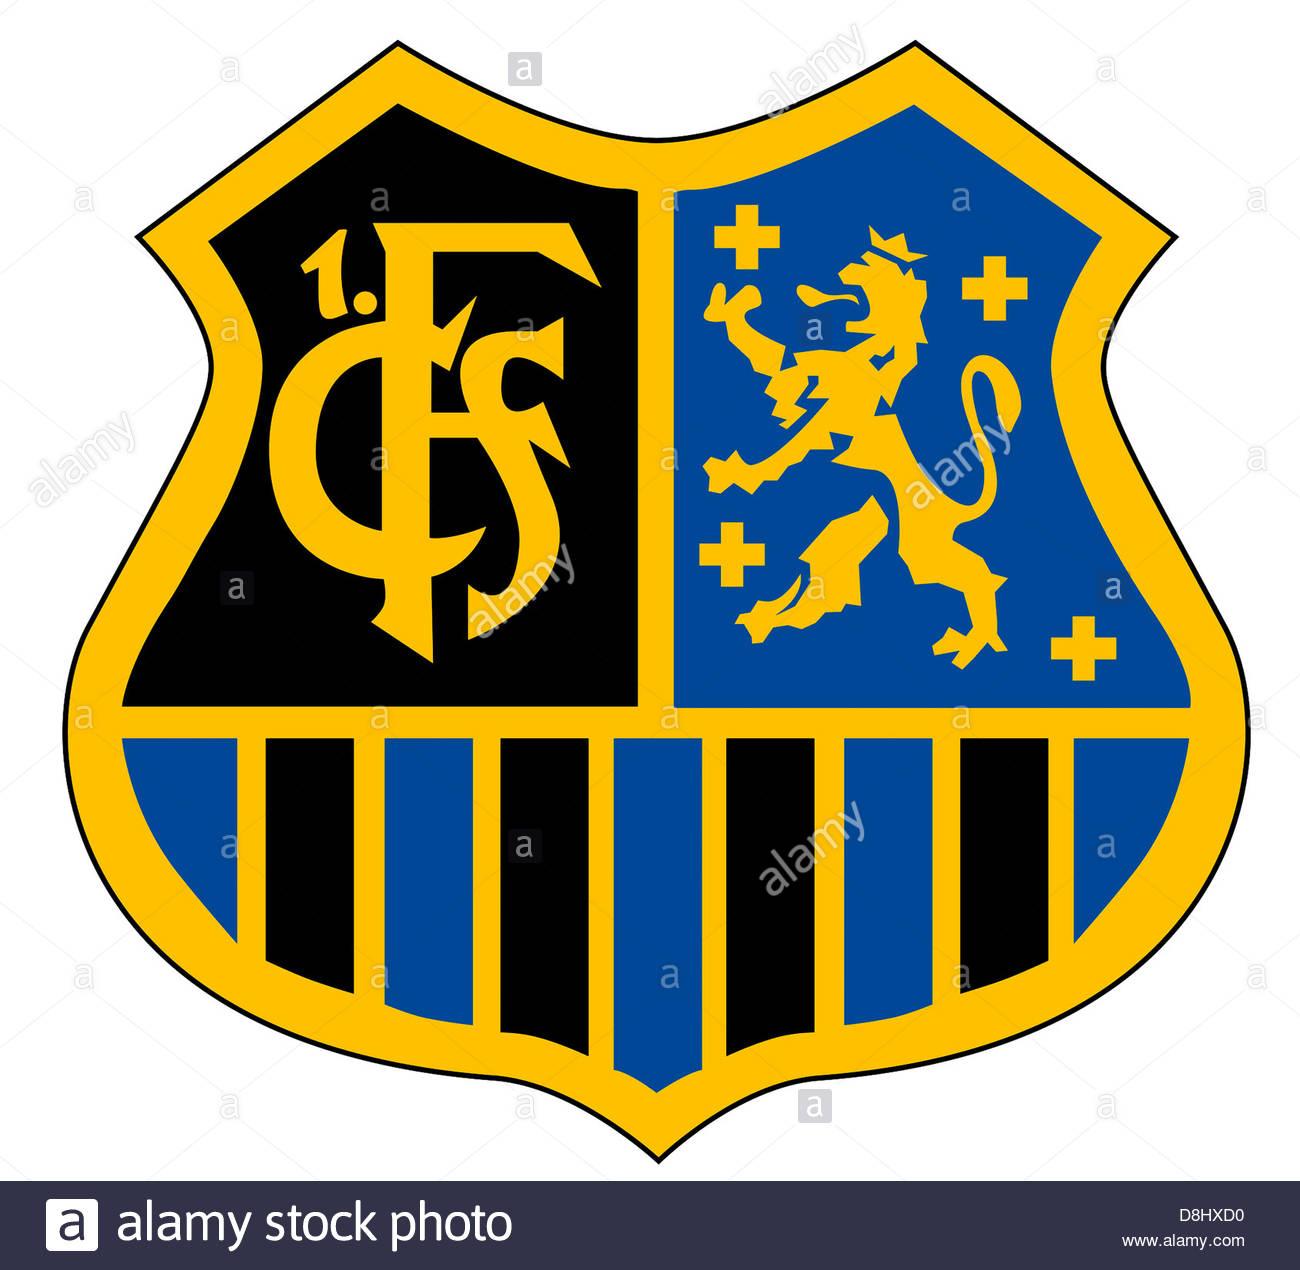 Logo Of German Football Team 1st Fc Saarbruecken Stock Photo.